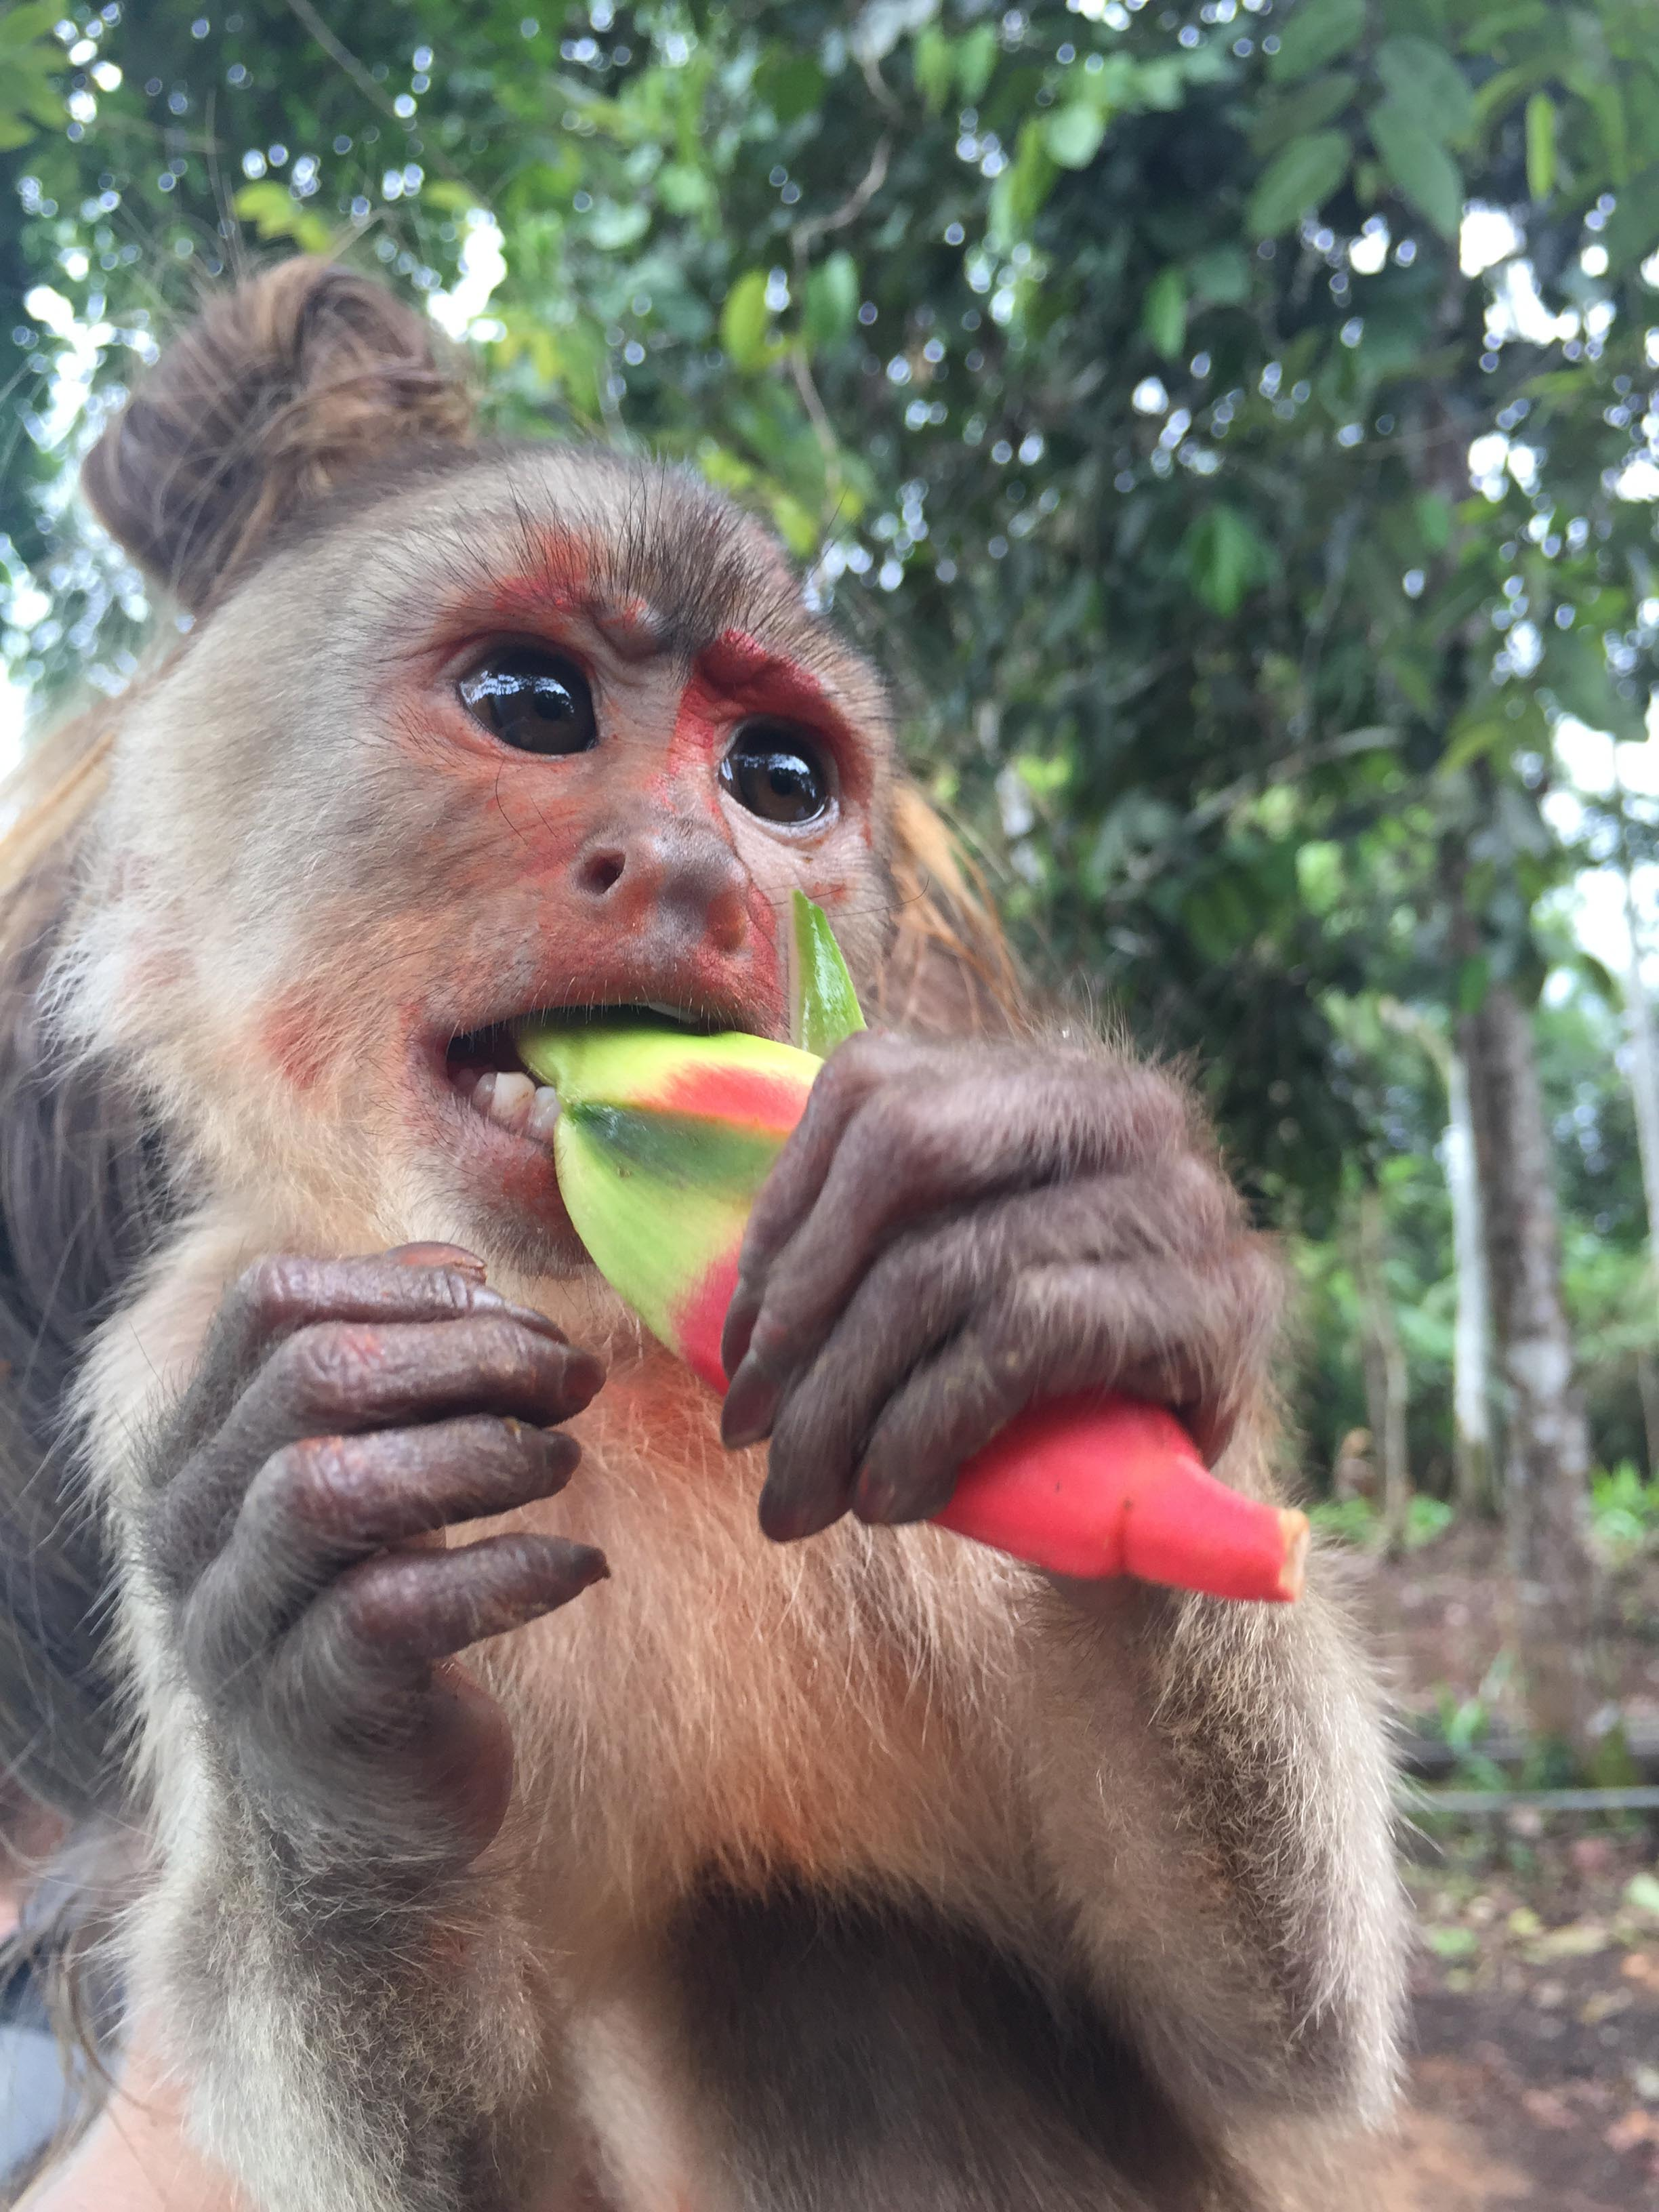 Monkey in the Amazon Rainforest.